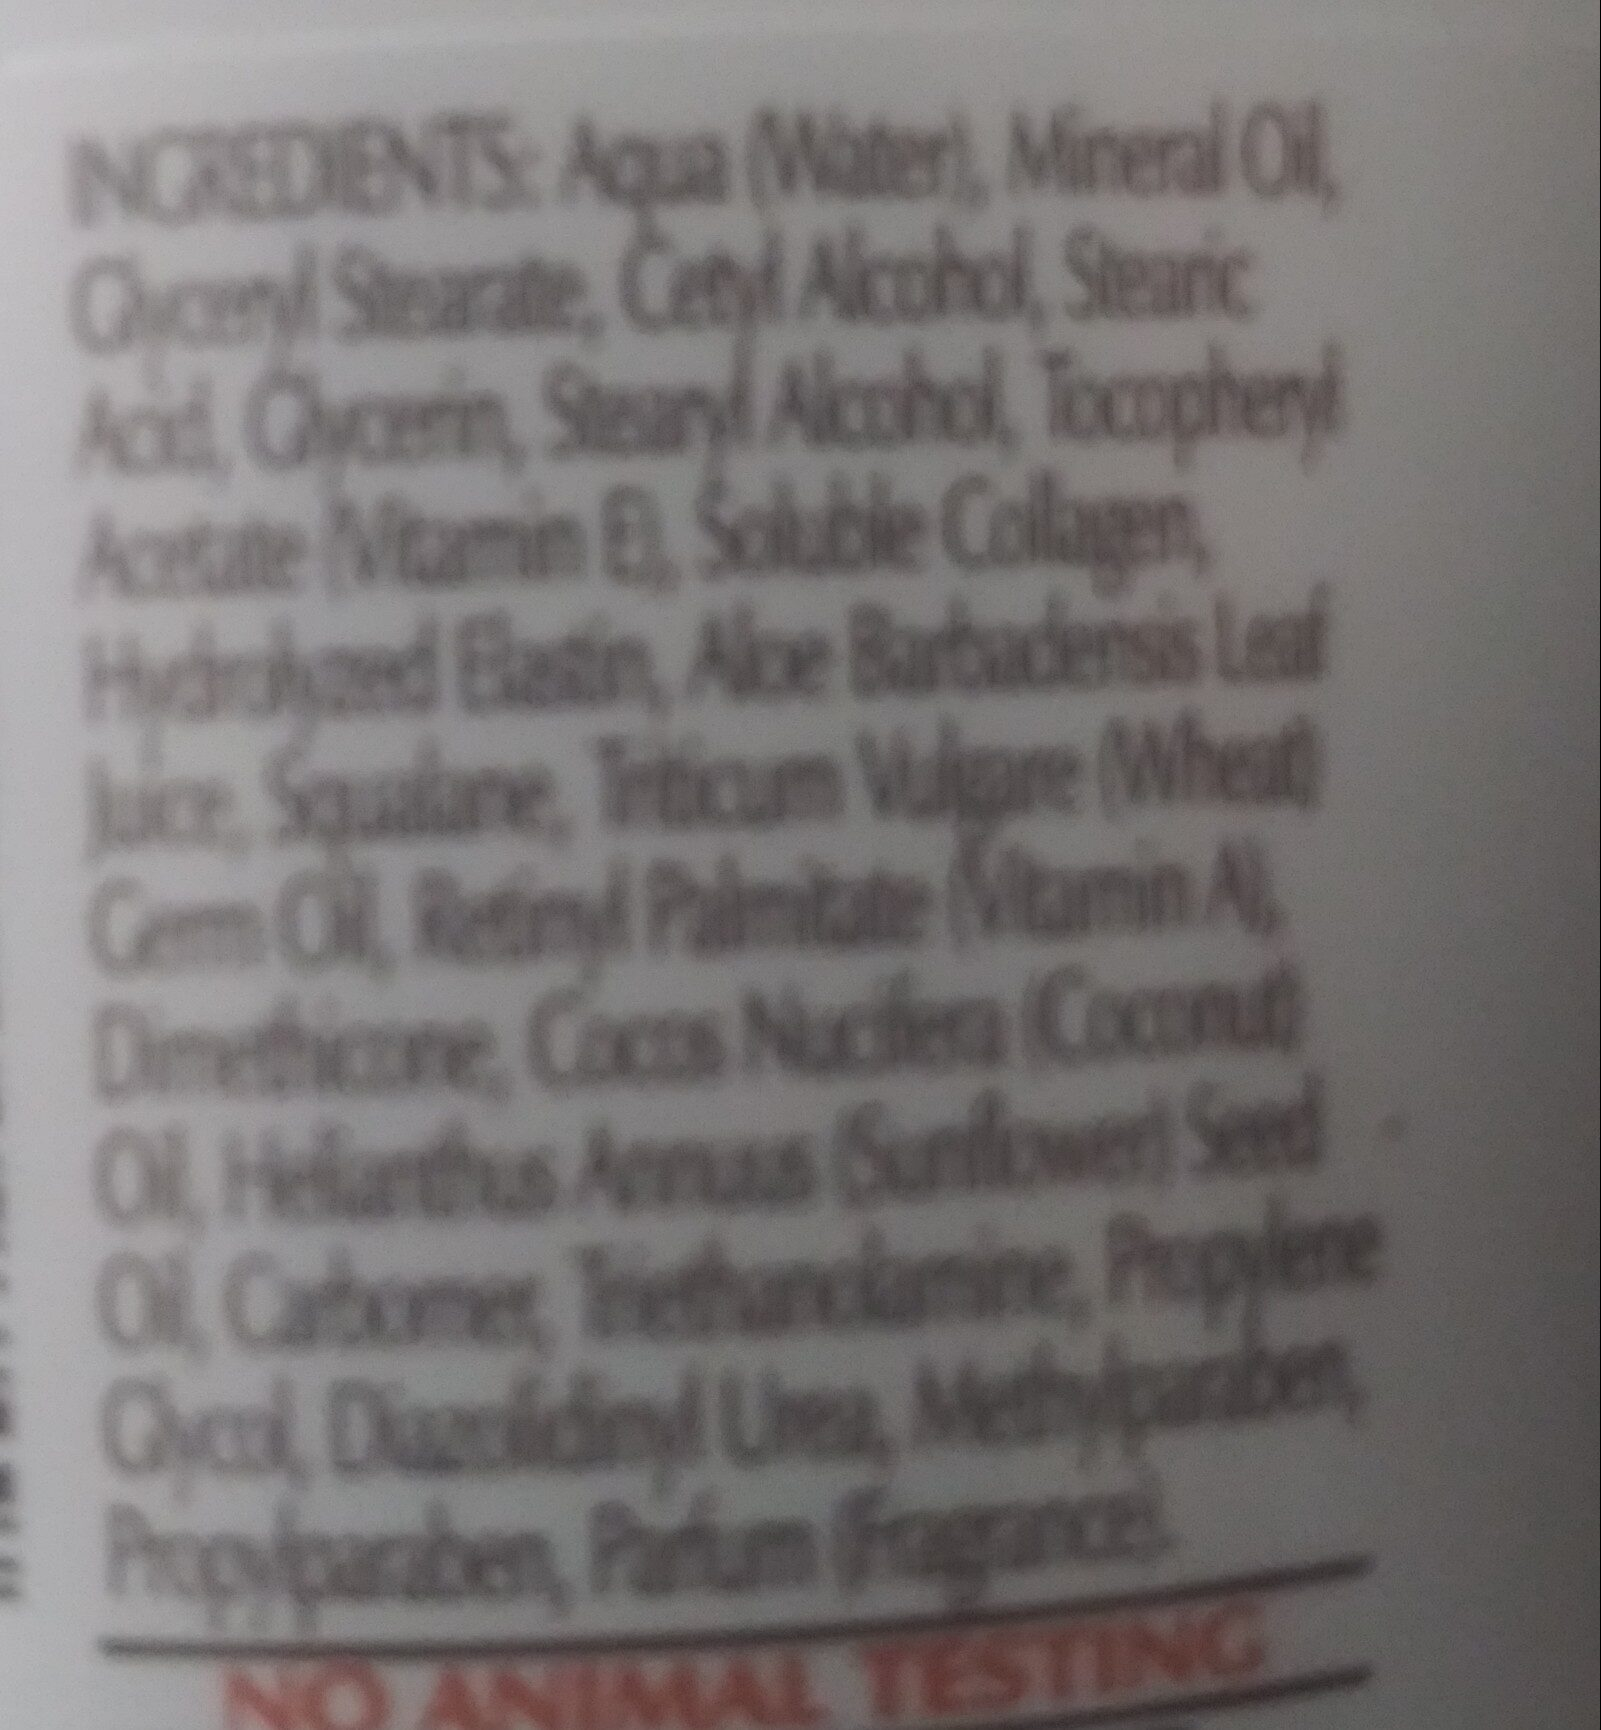 Vitamin E skin care cream - Ingredients - en